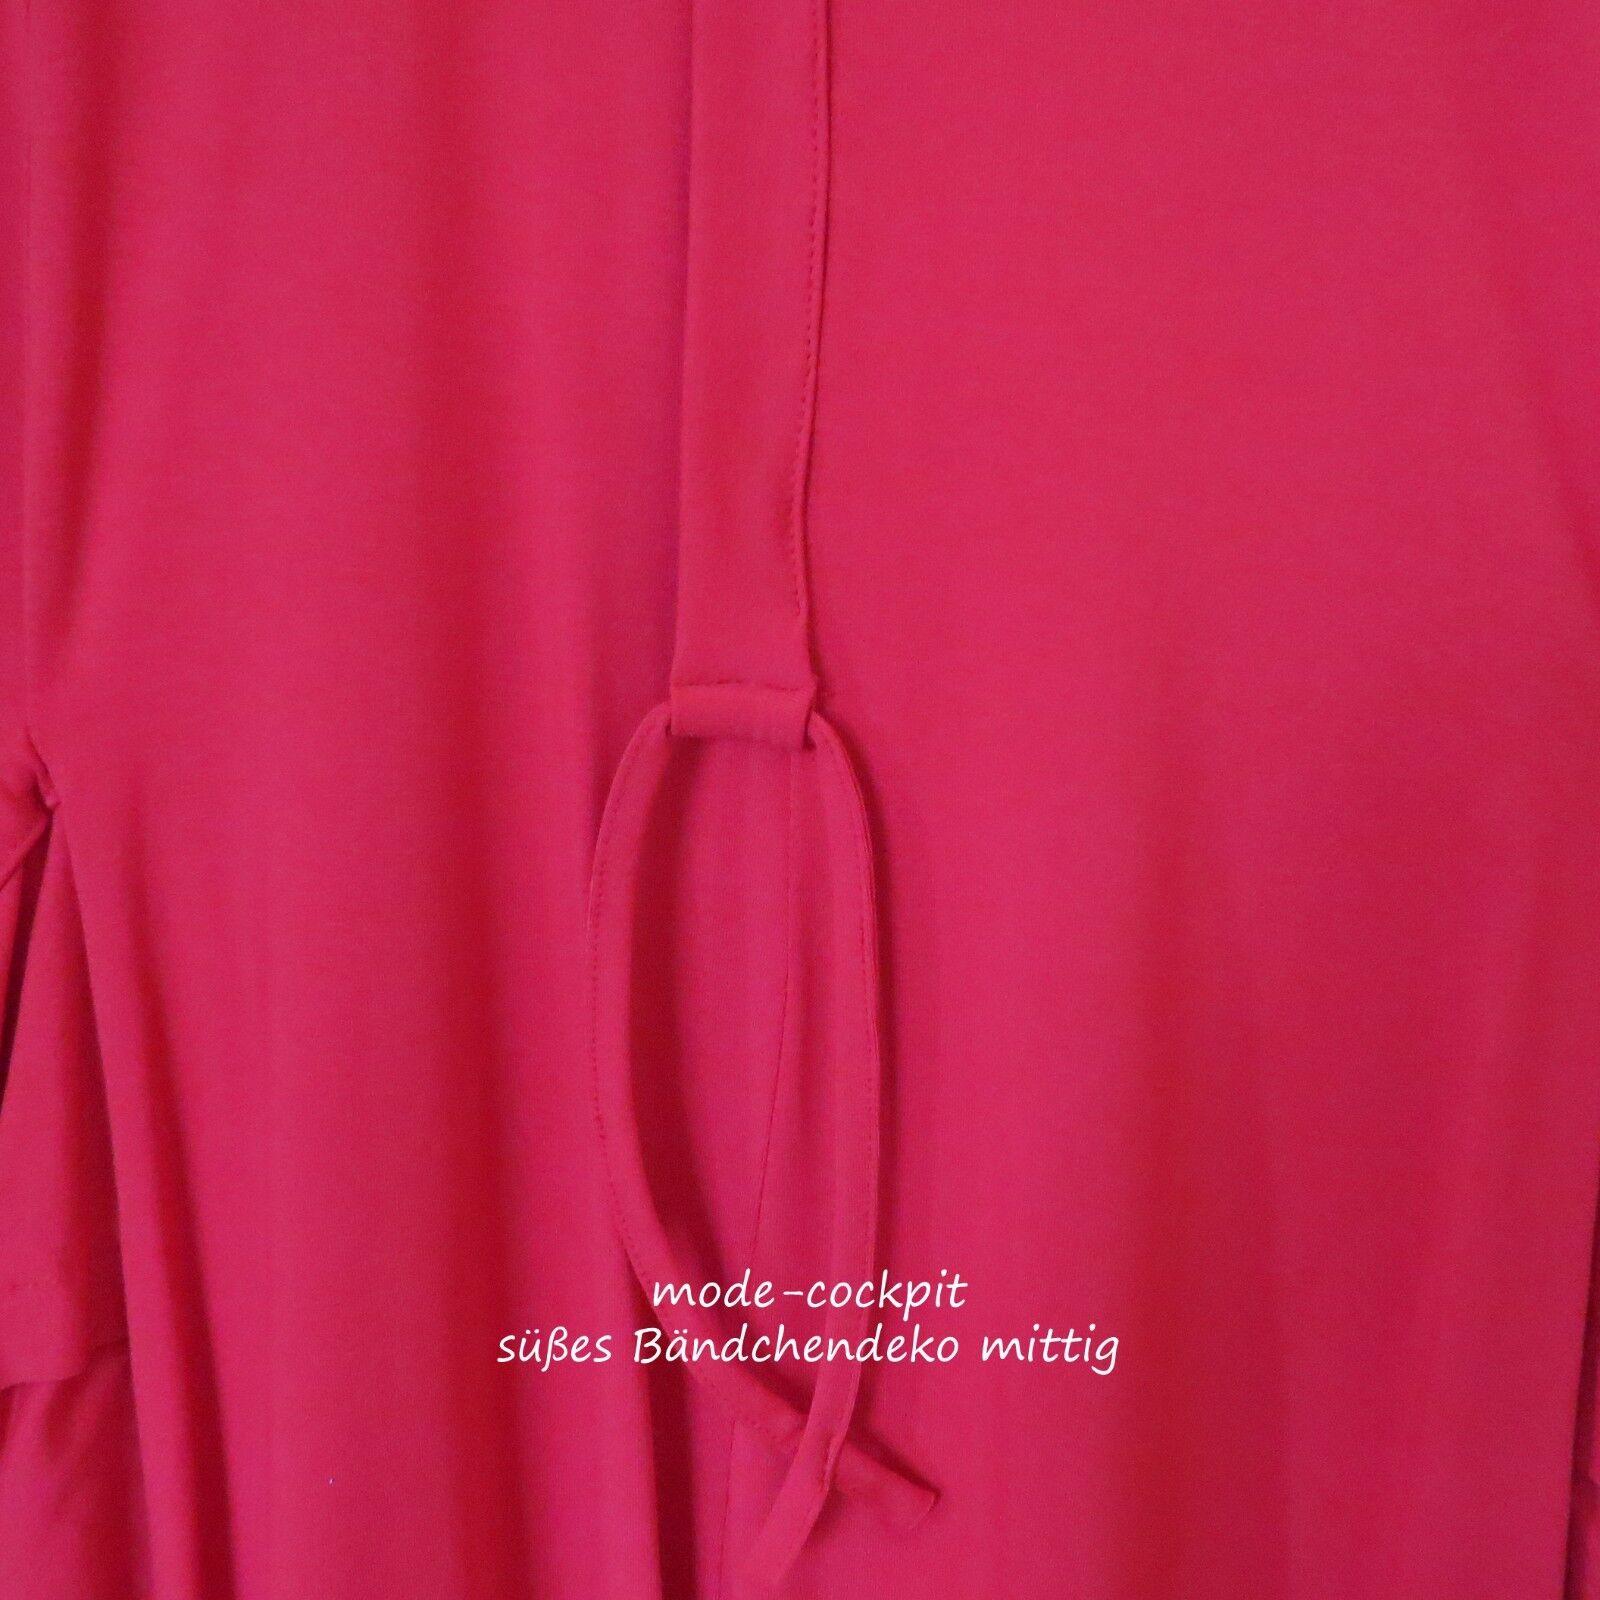 NEW JERSEY tolles Lagenlook Ballon Kleid Tunika Tunika Tunika Beuteltasche rot 48-50 2XL | Förderung  | Exquisite Handwerkskunst  | Smart  632396